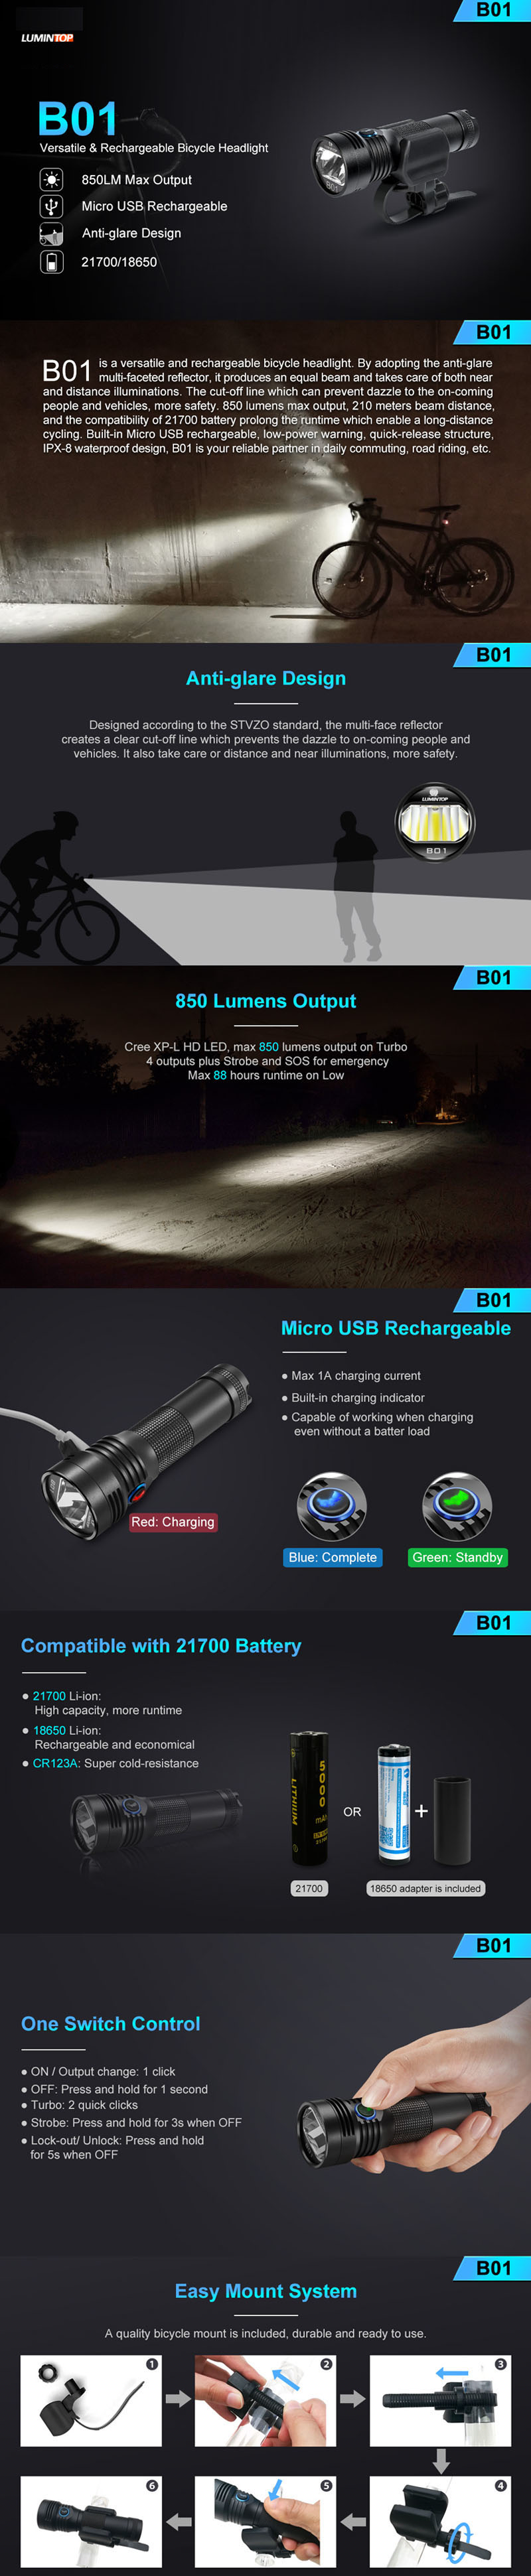 Lumintop BO1 Bike Light 850 lm CREE XP-l HD 18650//21700 Batterie Incluse